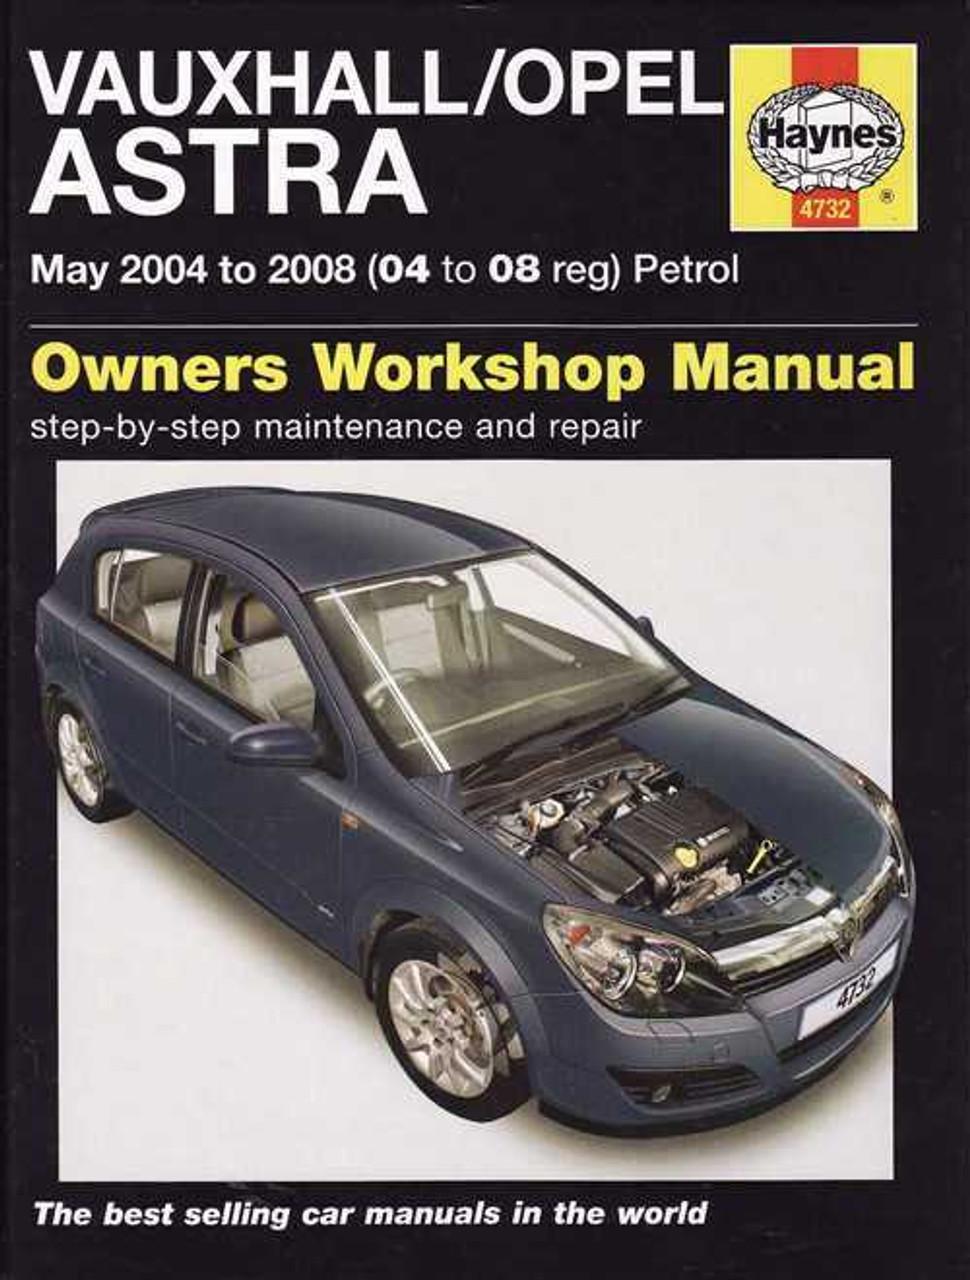 holden astra 2004 2008 petrol workshop manual rh automotobookshop com au opel astra h 2005 user manual opel astra h gtc 2005 manual